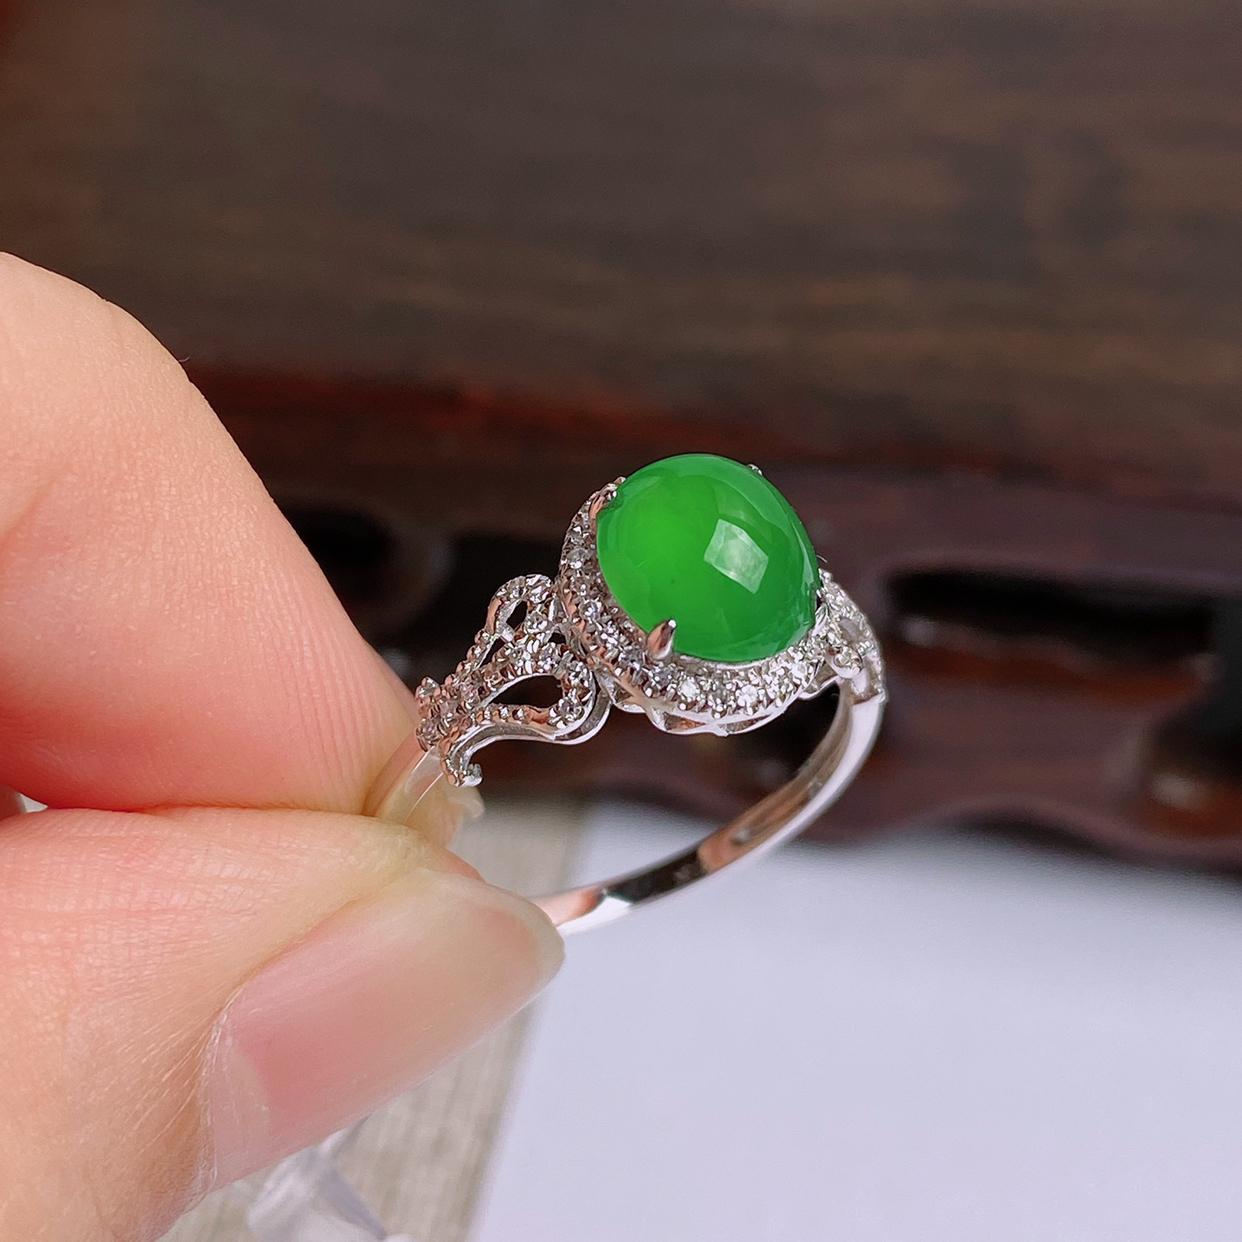 A货翡翠-种好满绿18K金伴钻蛋面戒指,尺寸-裸石7.6*6.8*3.8mm整体9.6*8.5*7.